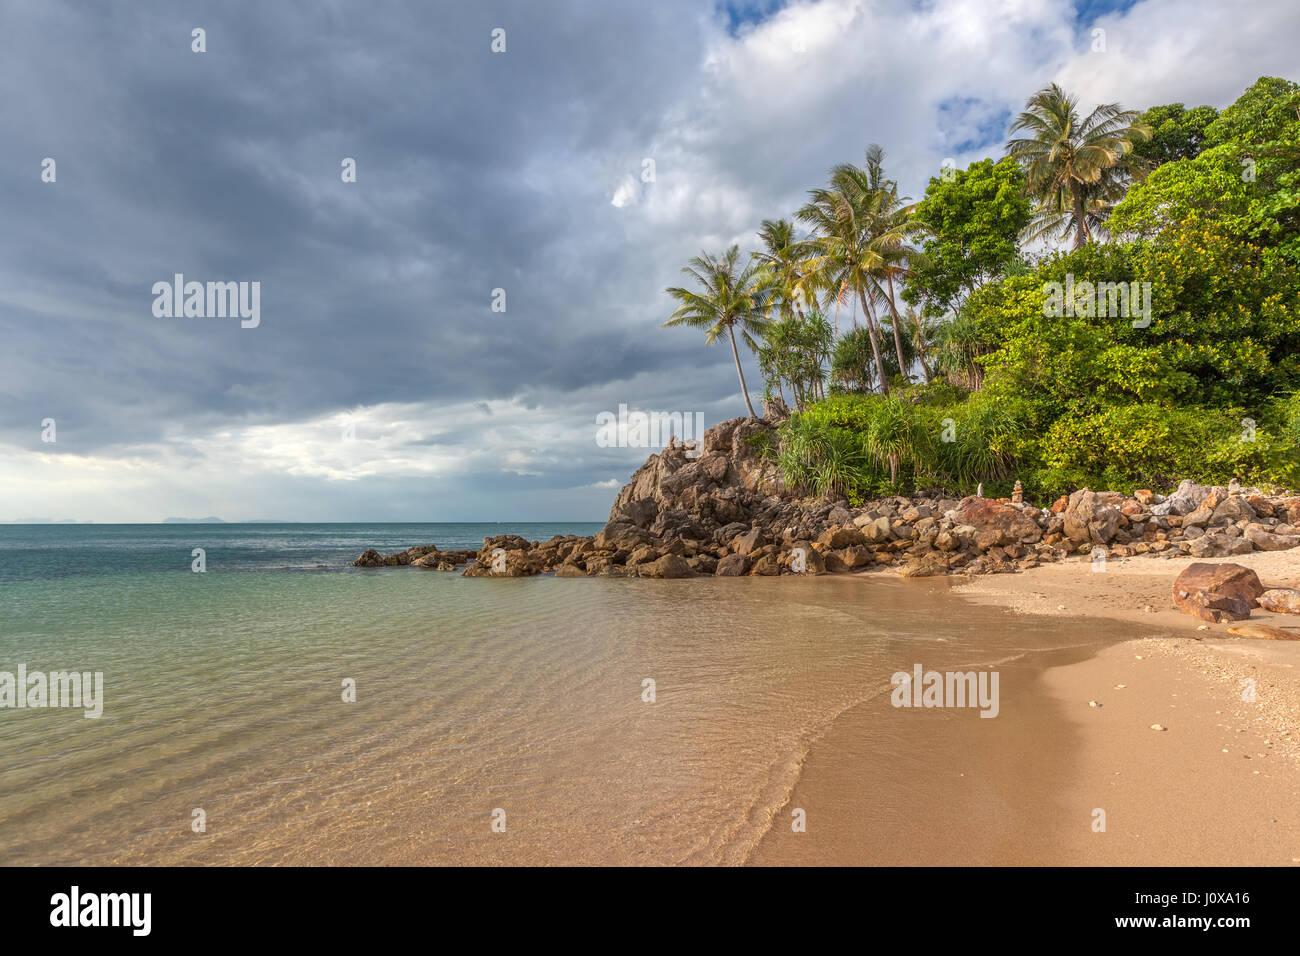 Long Beach in Koh Lanta Yai, Provincia di Krabi, Thailandia, Sud-est asiatico Immagini Stock